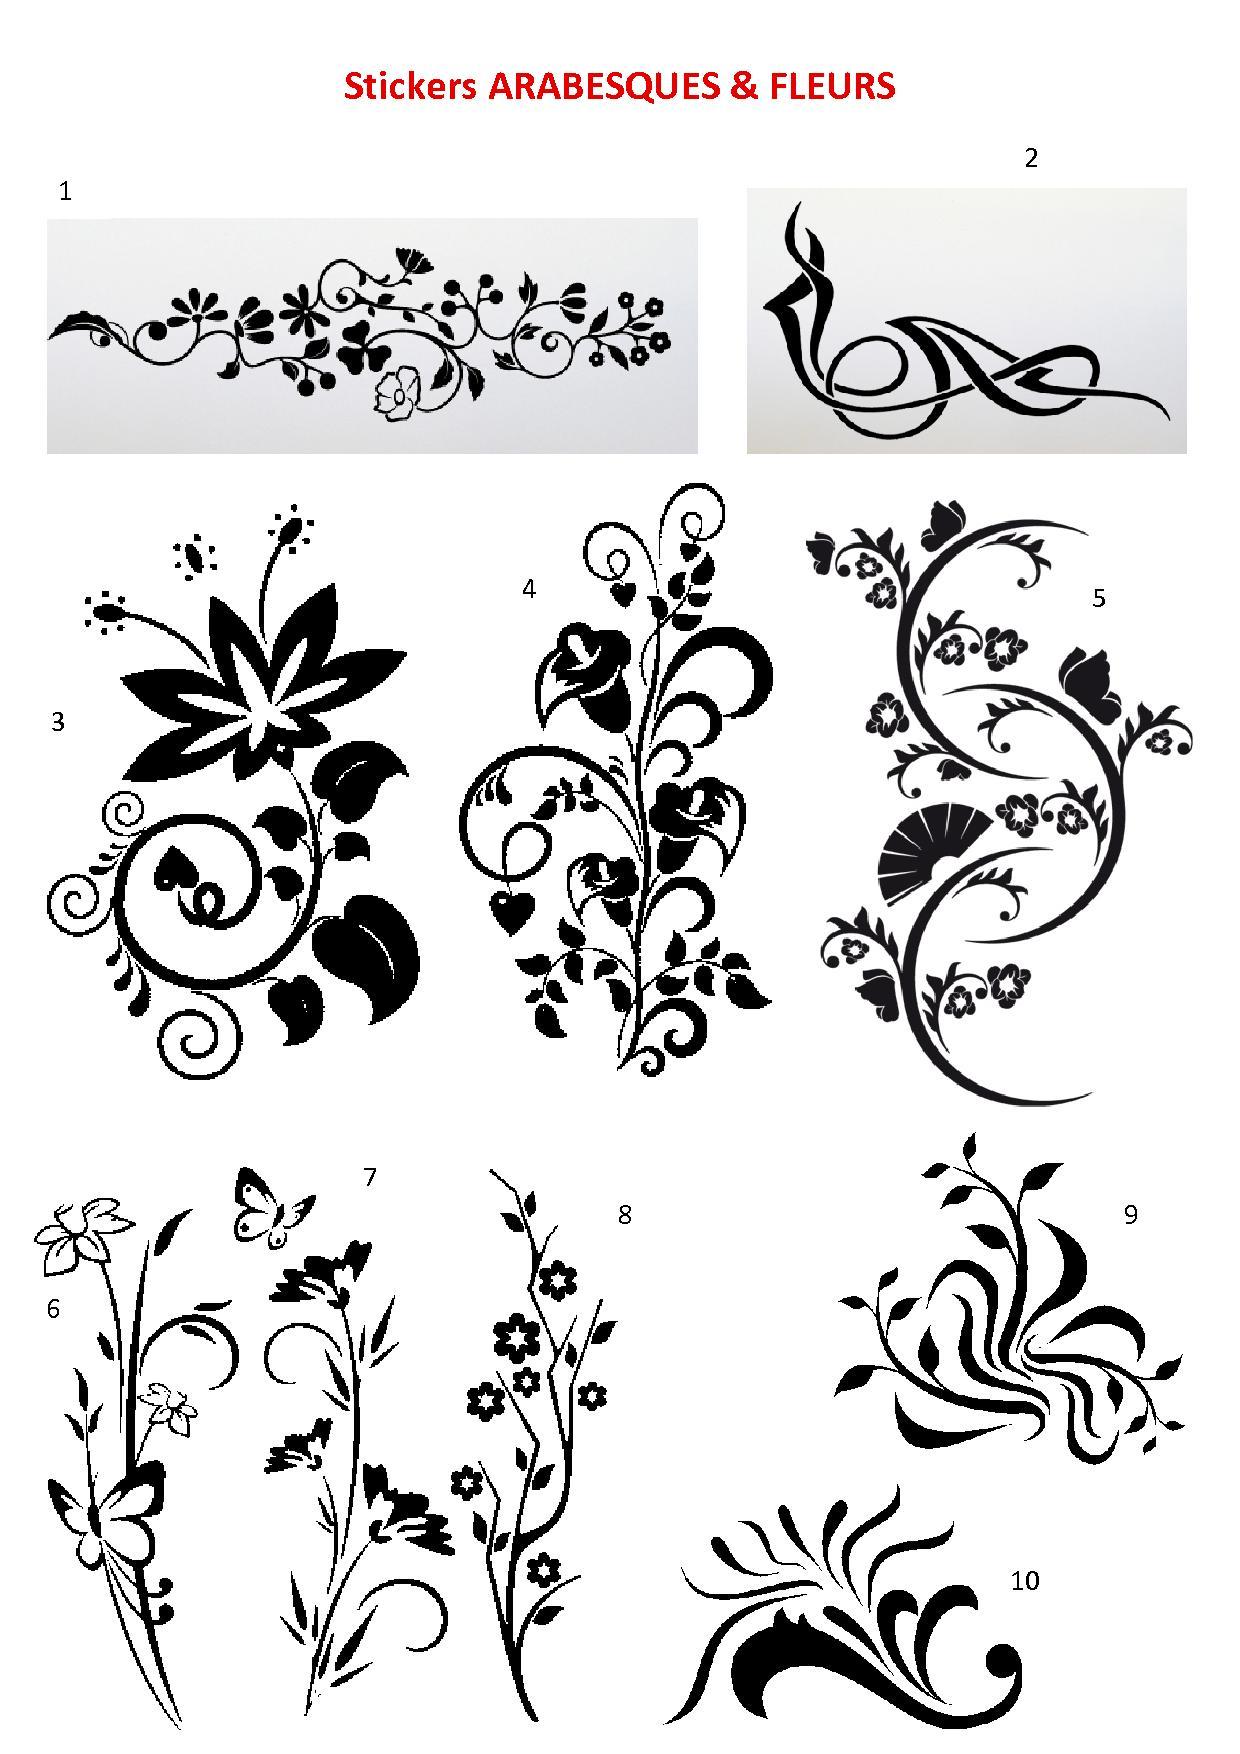 pin cheville arabesque femme motif tatouage modle tattoo. Black Bedroom Furniture Sets. Home Design Ideas